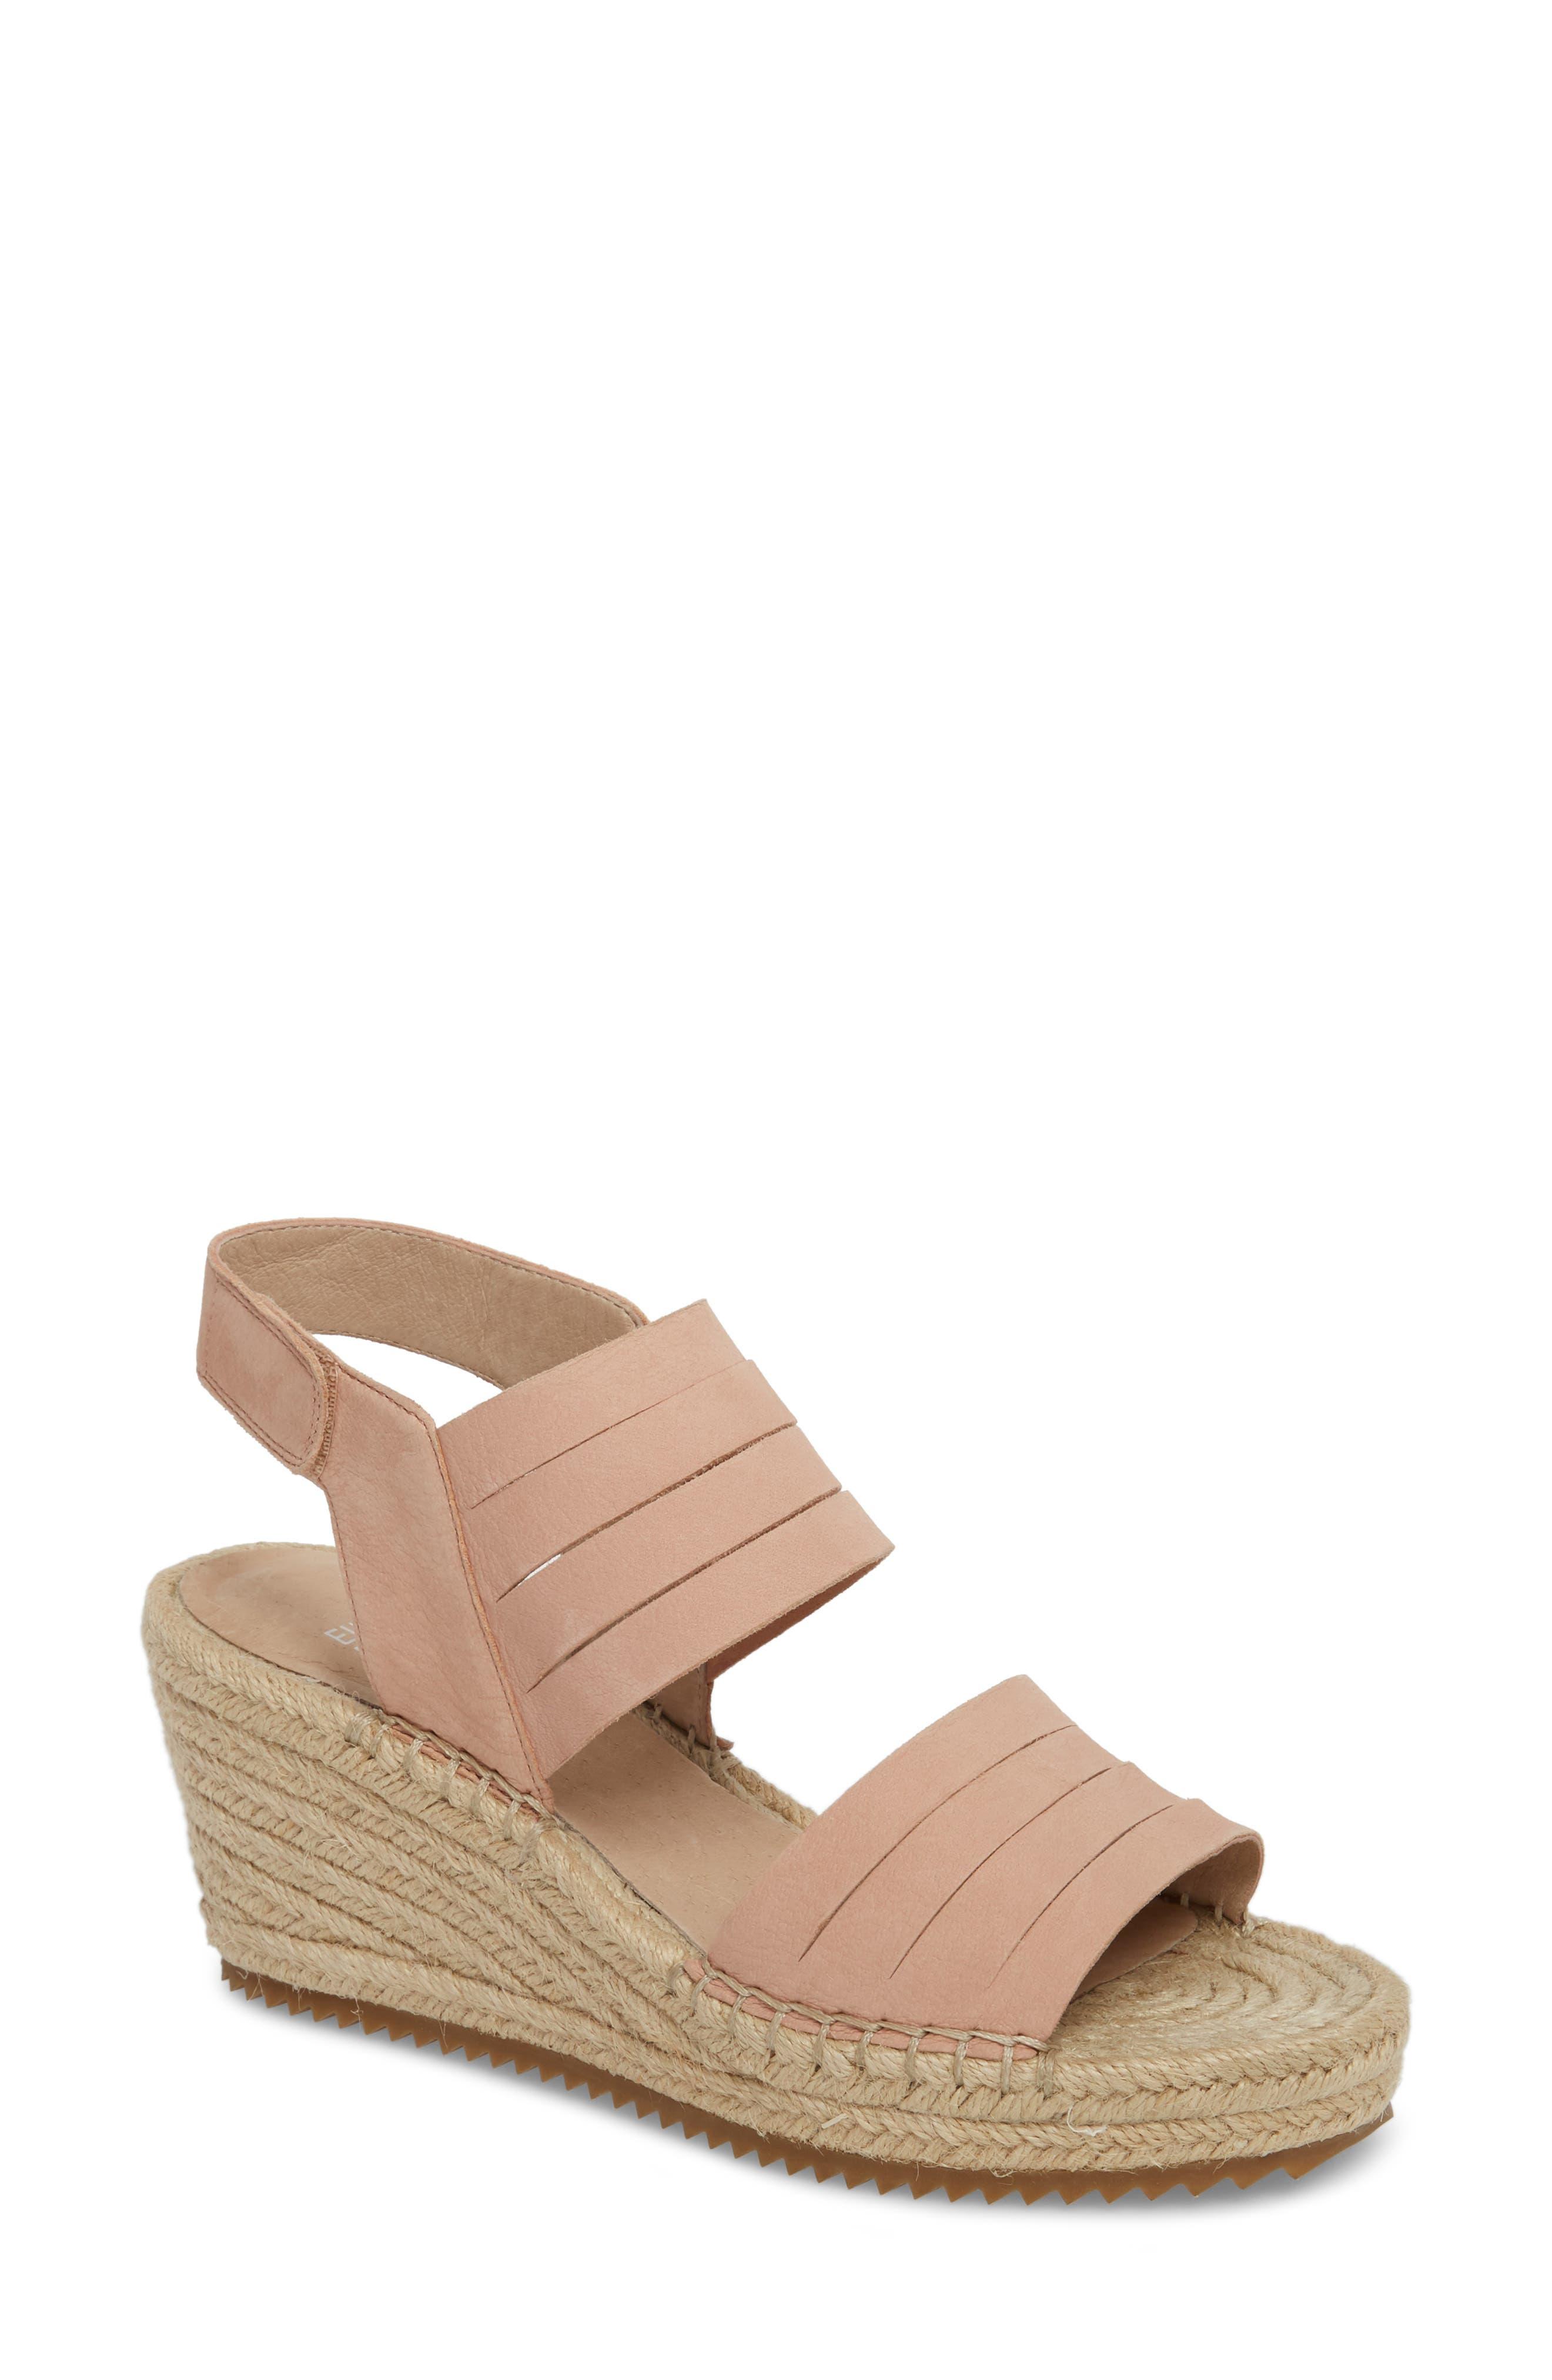 Largo Espadrille Wedge Sandal,                         Main,                         color, Toffee Cream Nubuck